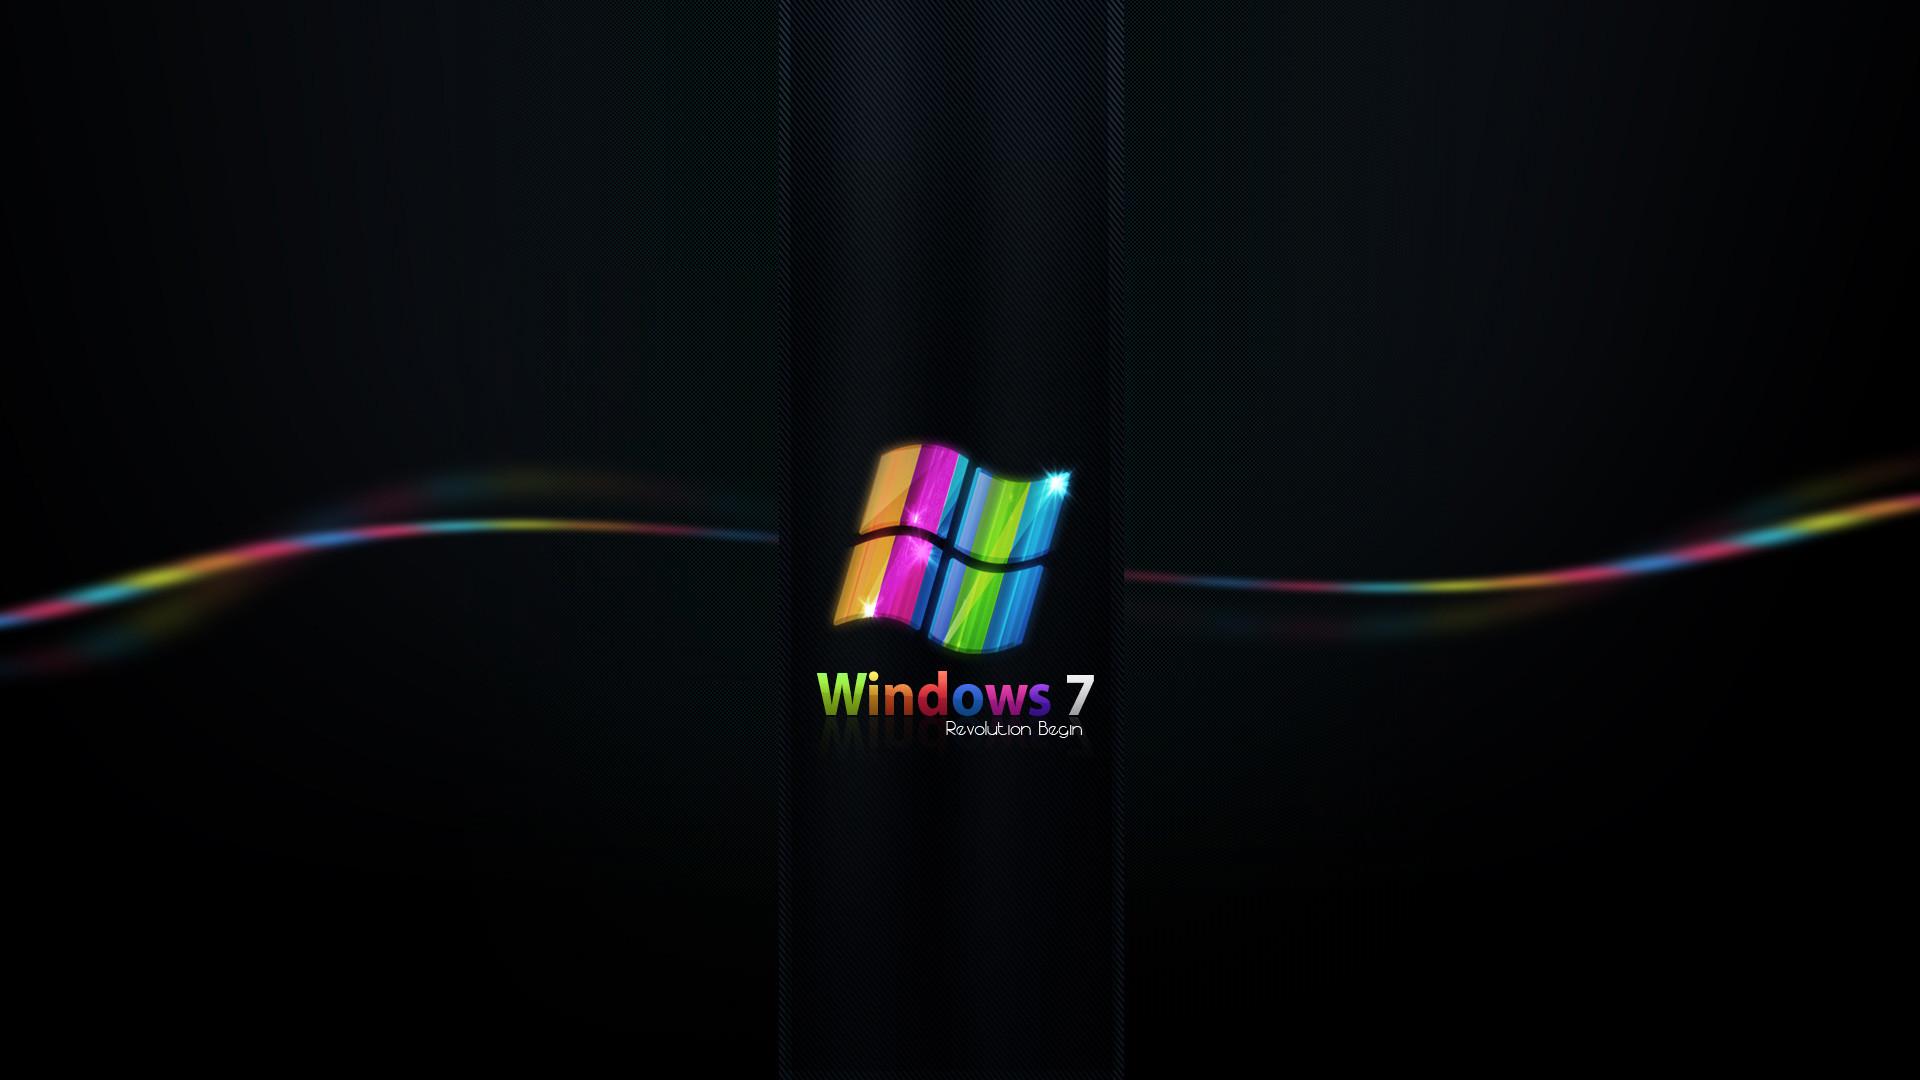 Rainbow Colored Windows 7